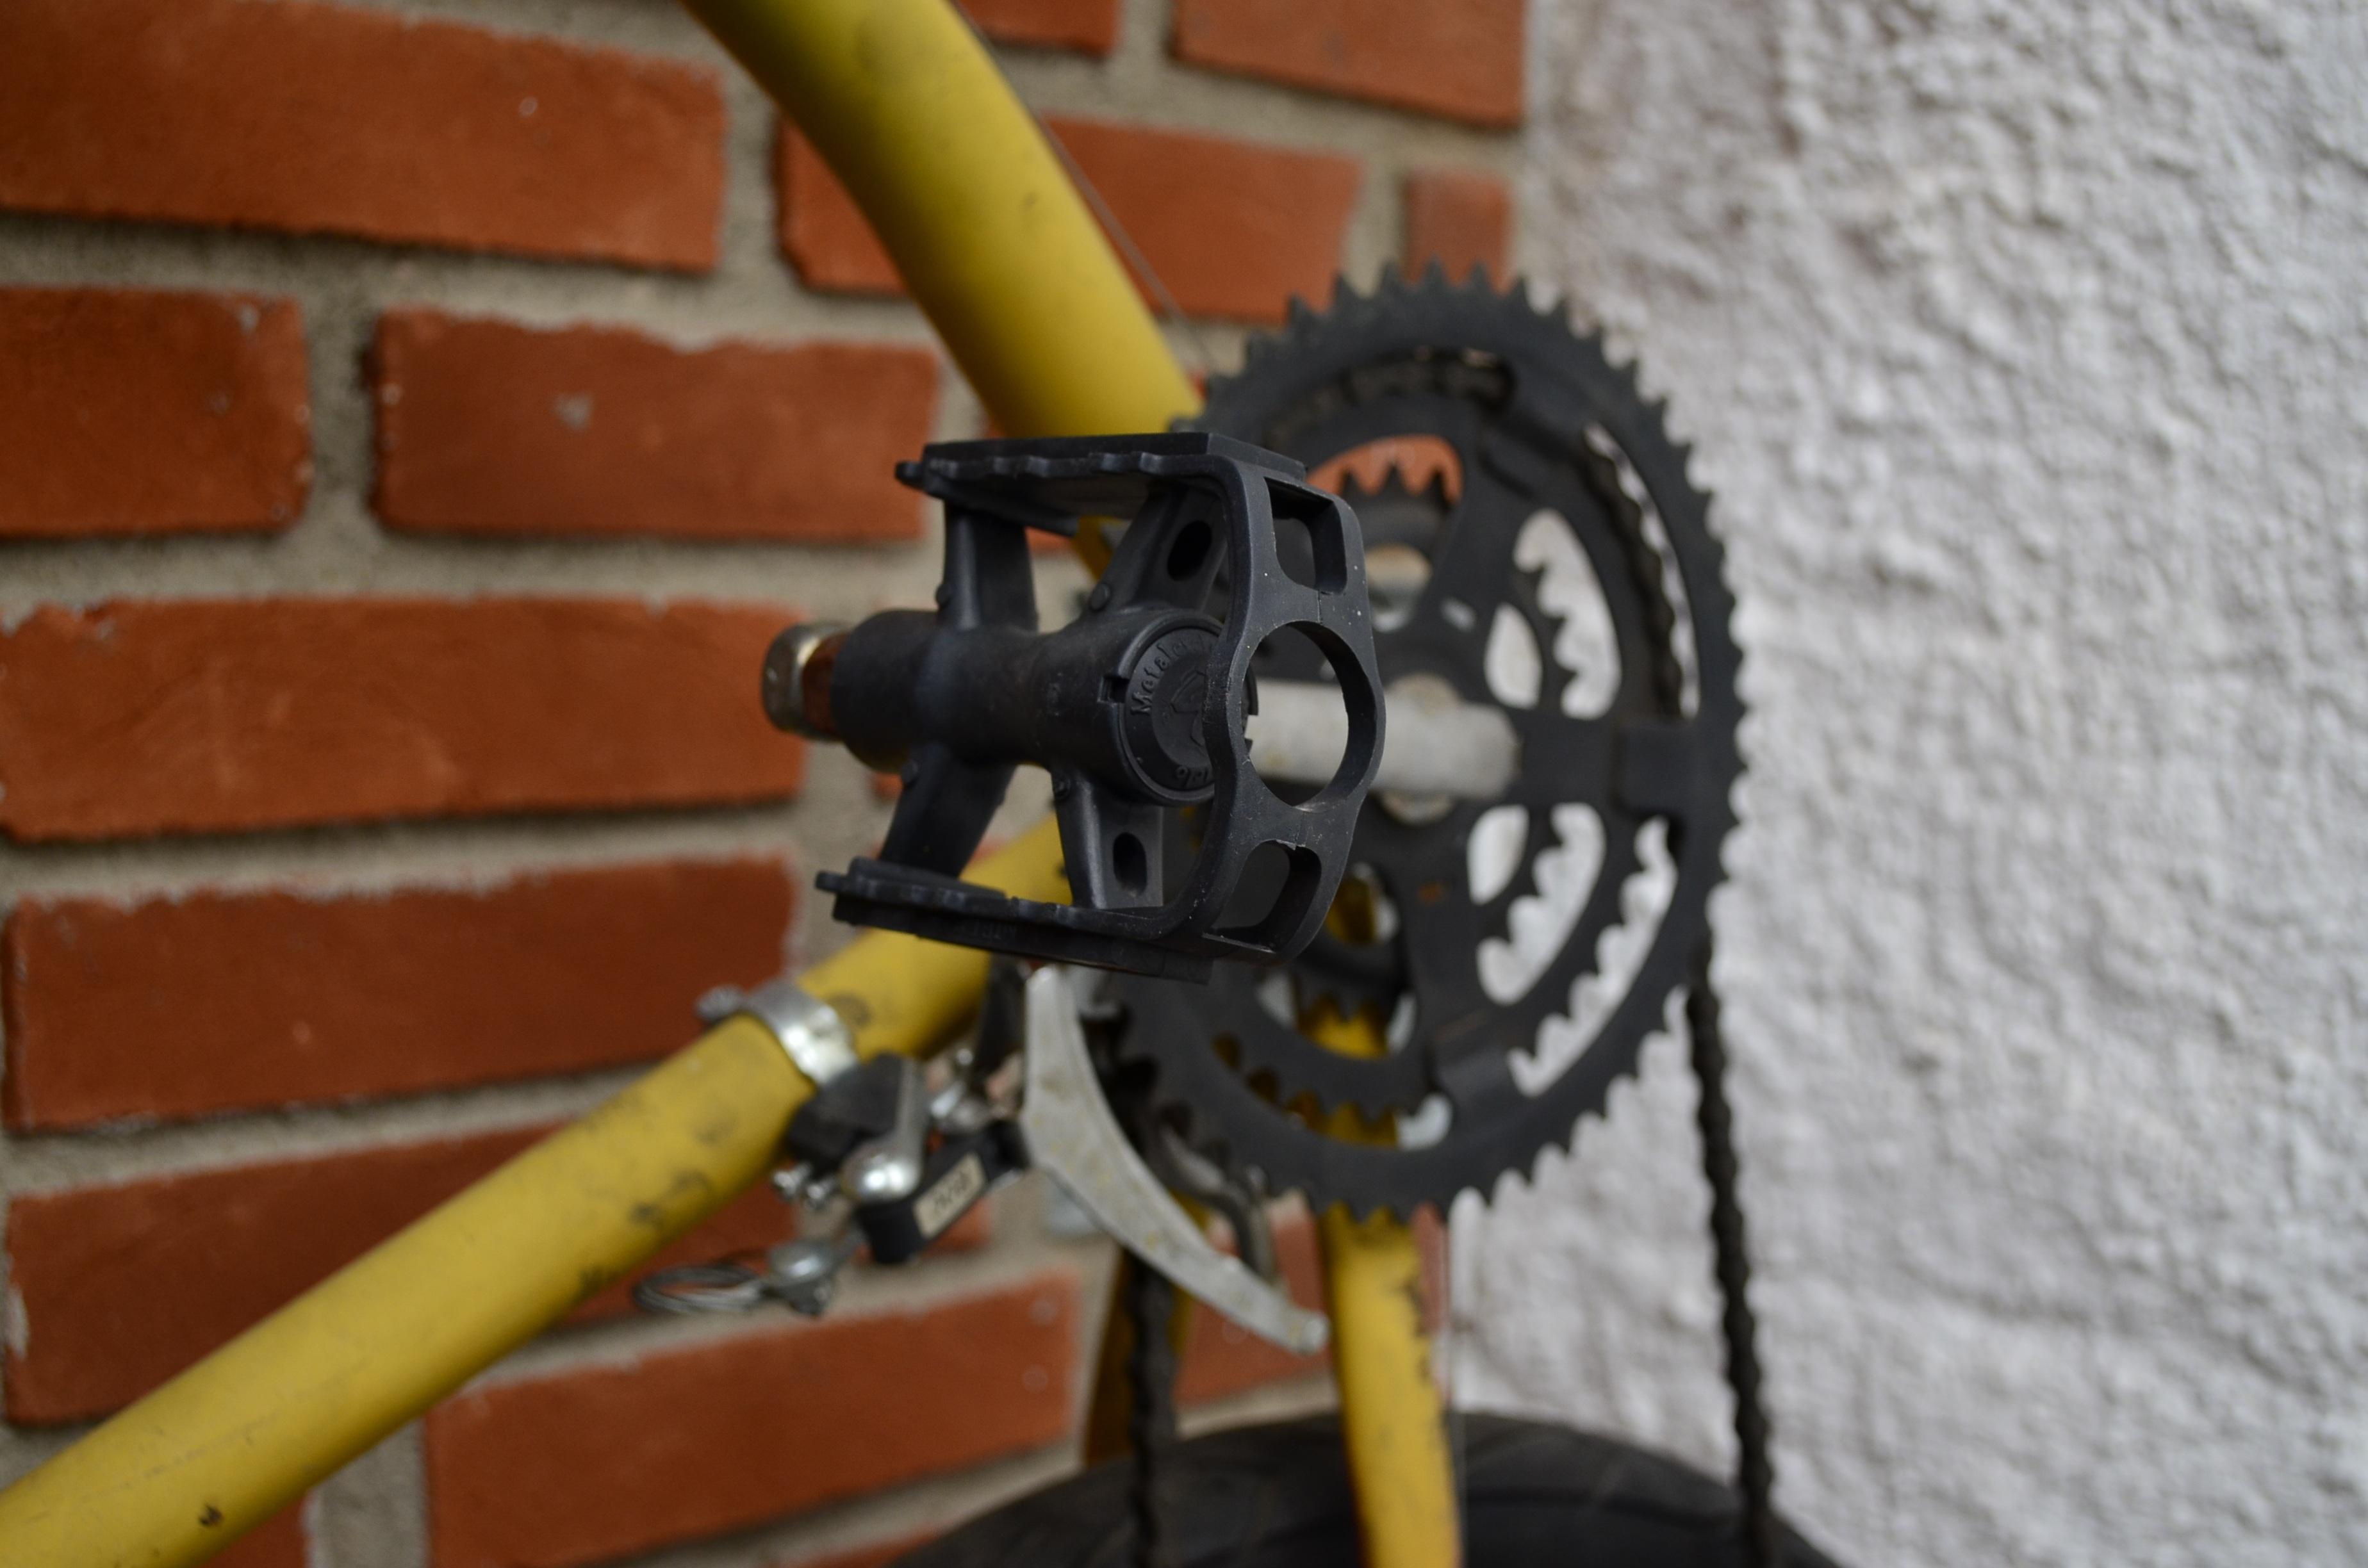 Gambar Roda Kendaraan Gigi Kuning Sepeda Gunung Mahkota